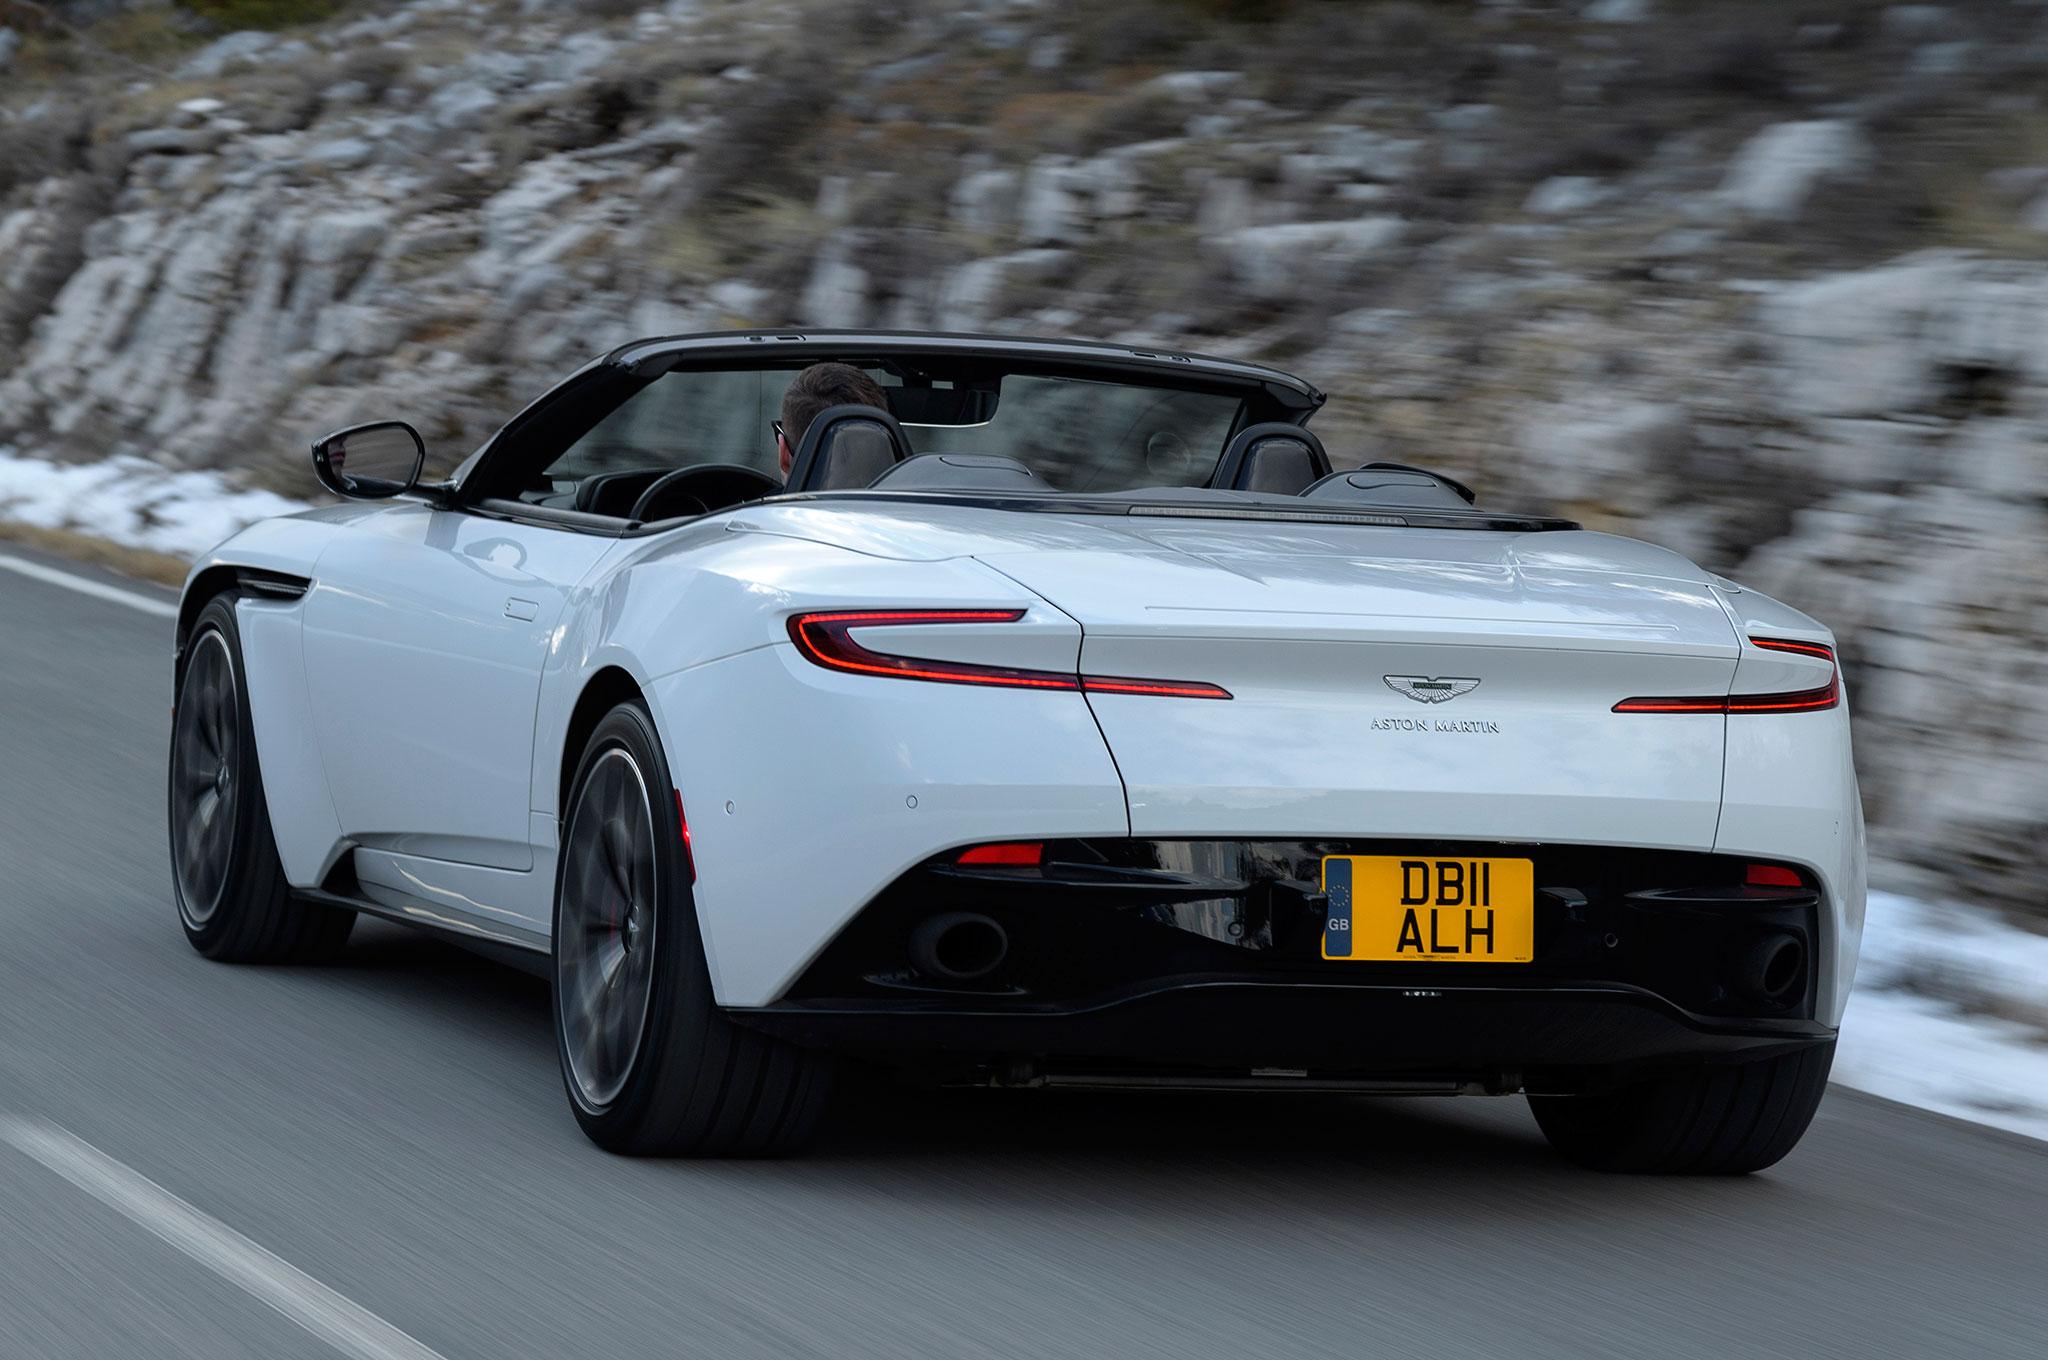 2019 Aston Martin Db11 Volante First Drive Review Automobile Magazine